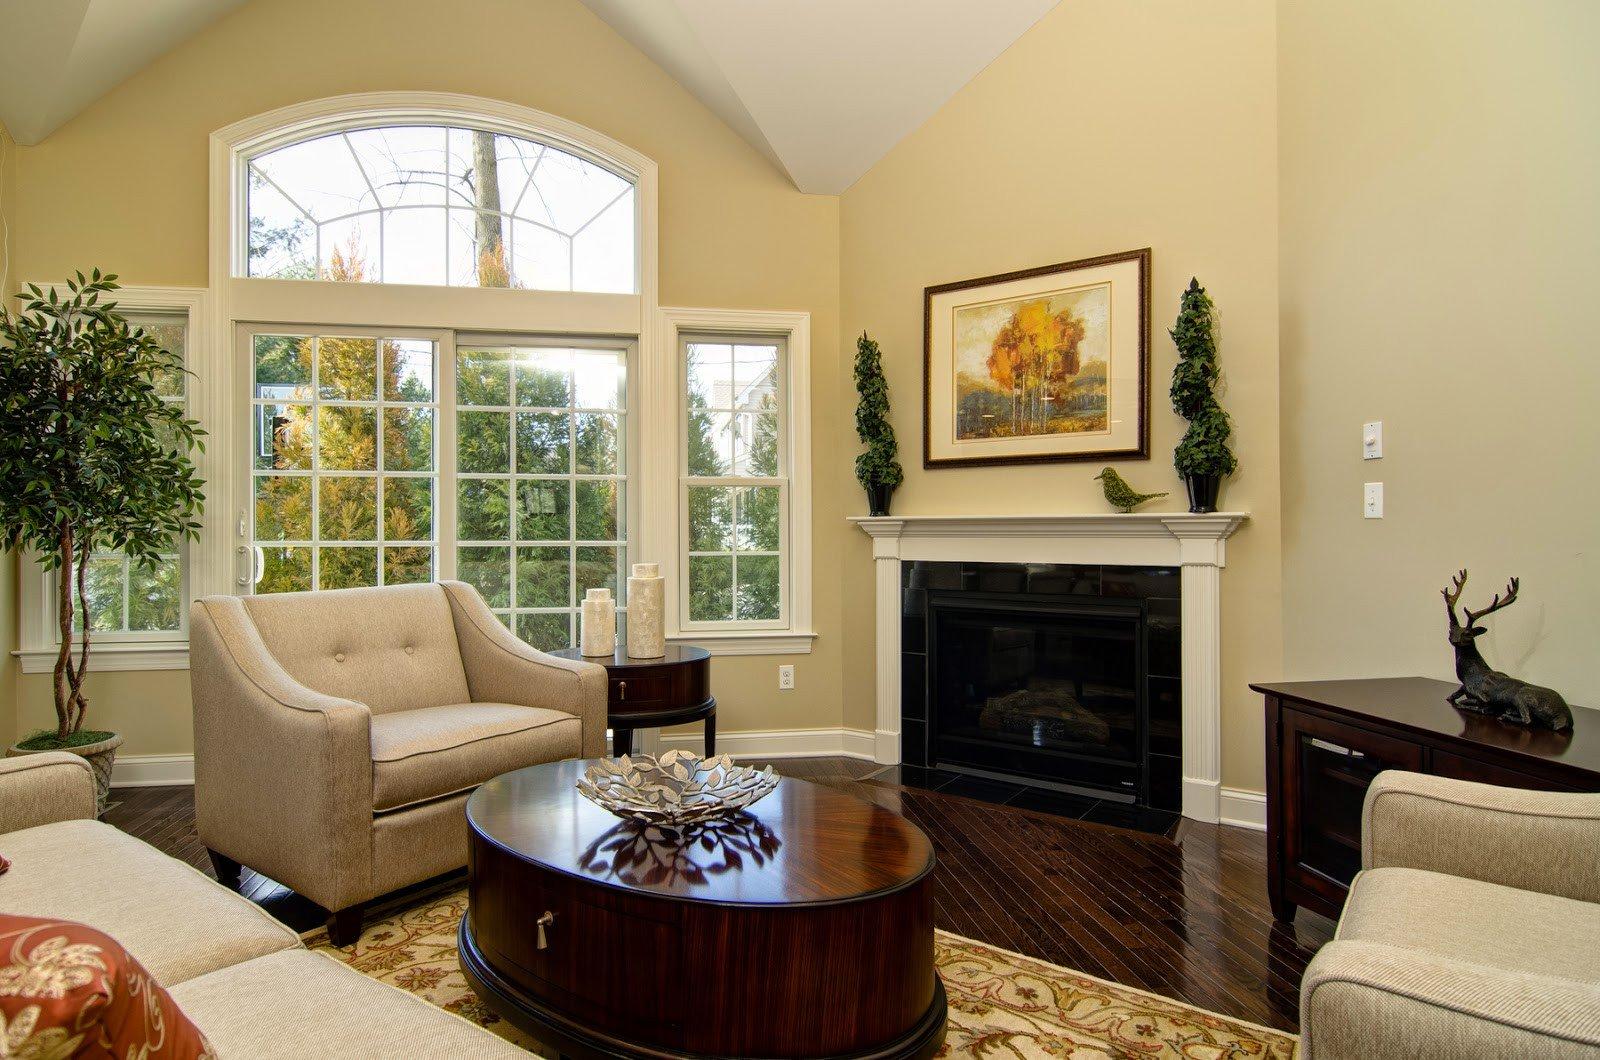 Comfortable Living Room Decorating Ideas Elegant fortable Living Room Decorating Ideas Modern